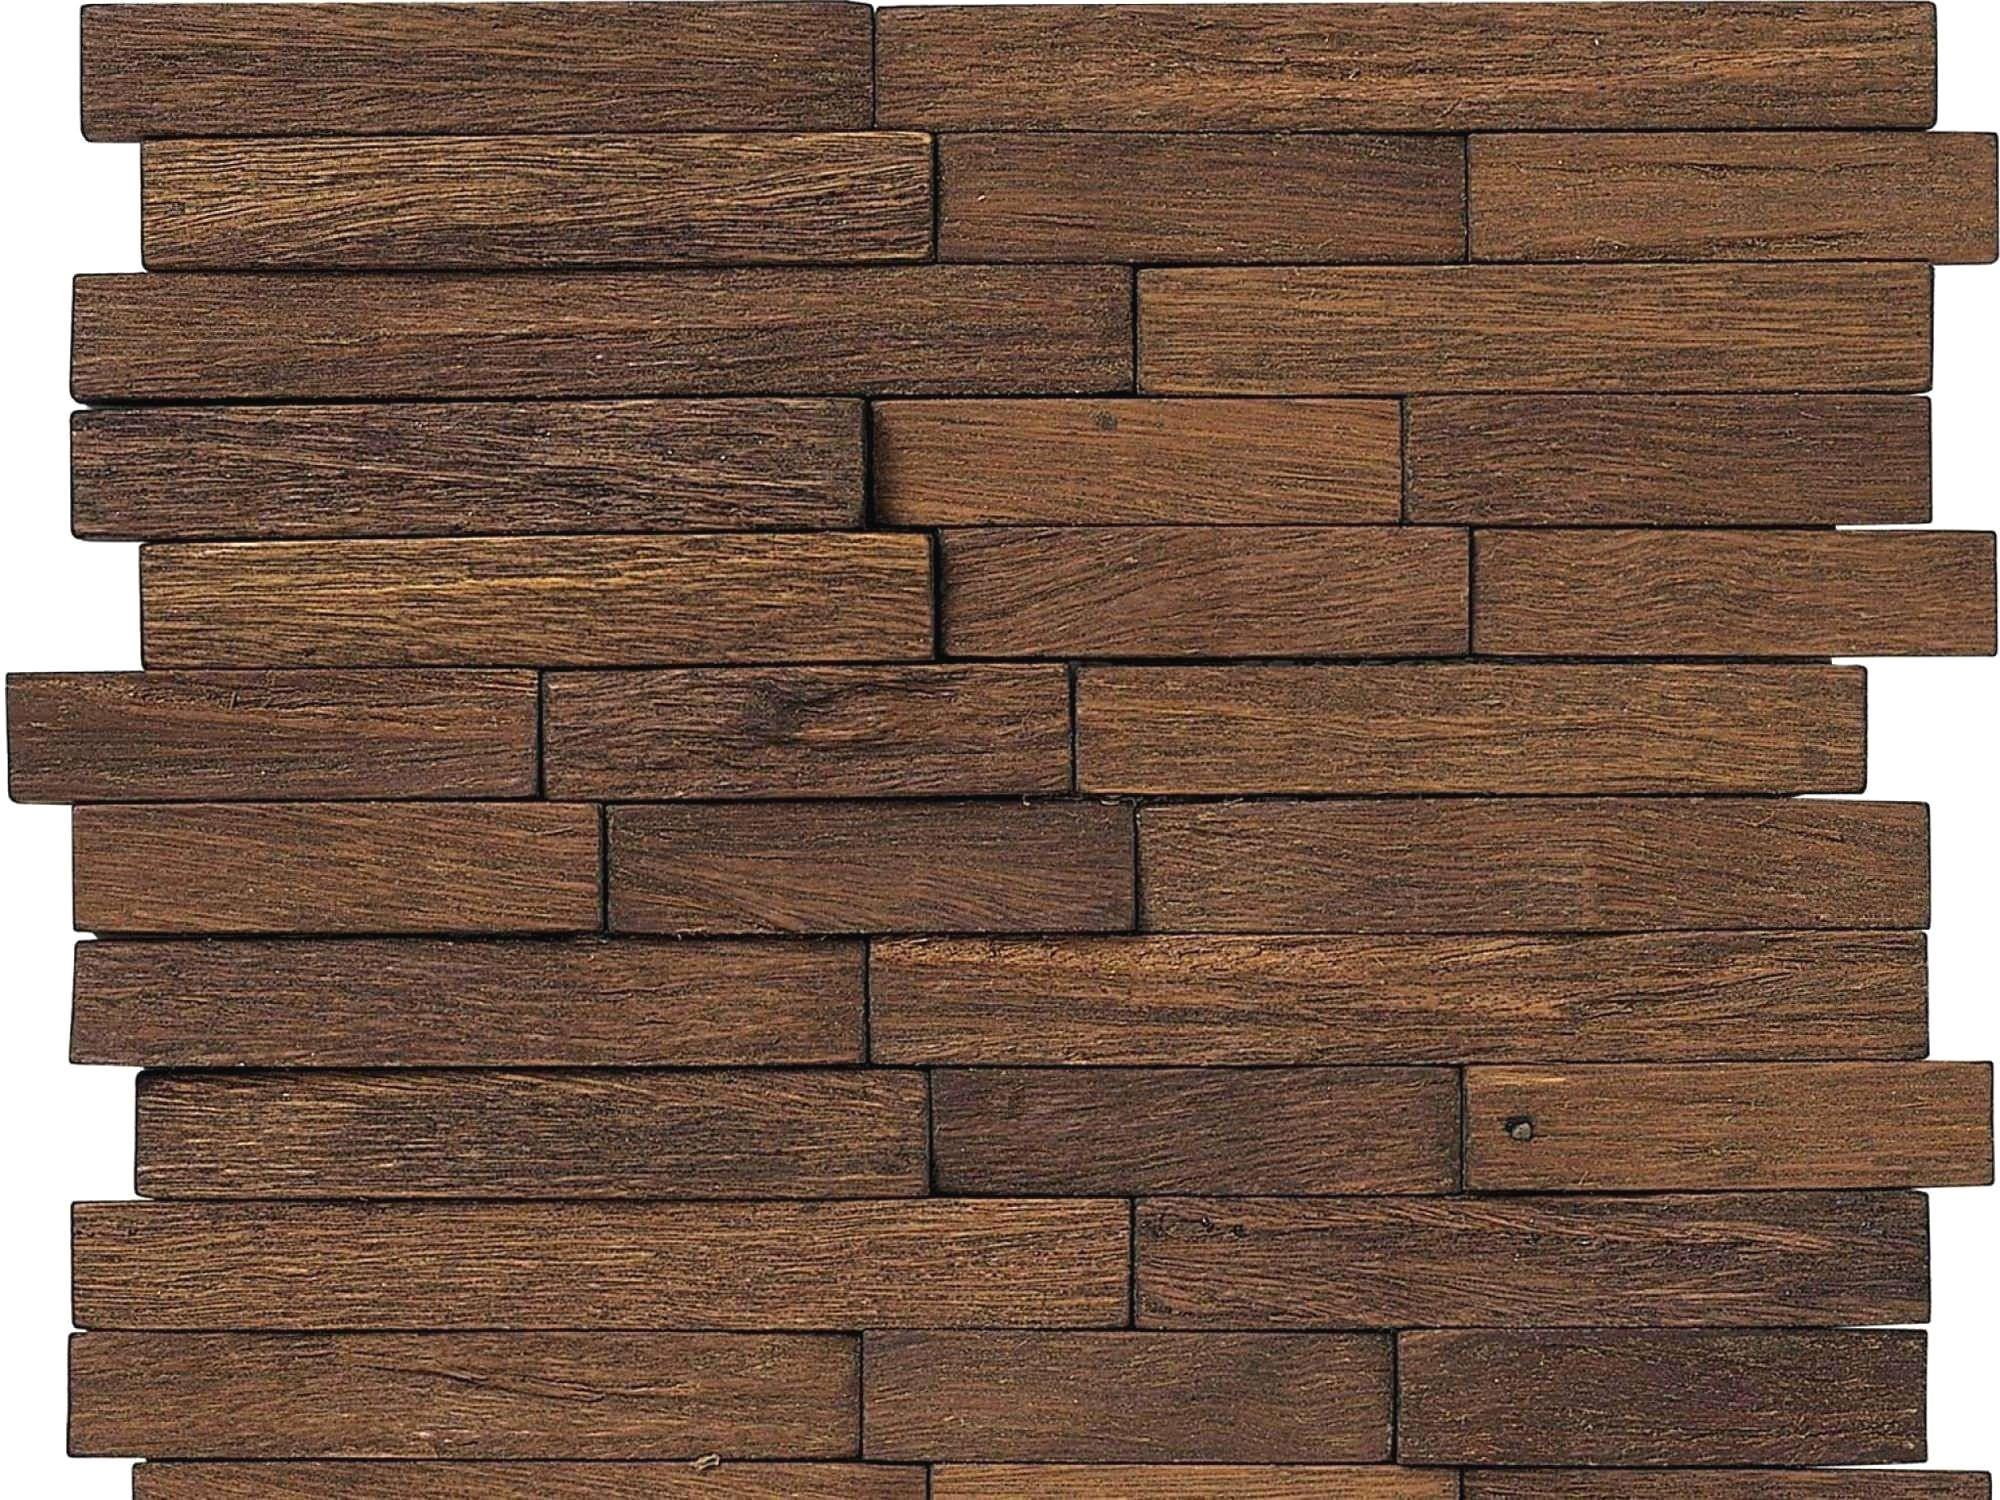 1 hardwood flooring of 10 diy wood flooring collections economyinnbeebe com with diy home design new metal wall art panels fresh 1 kirkland wall decor home design 0d